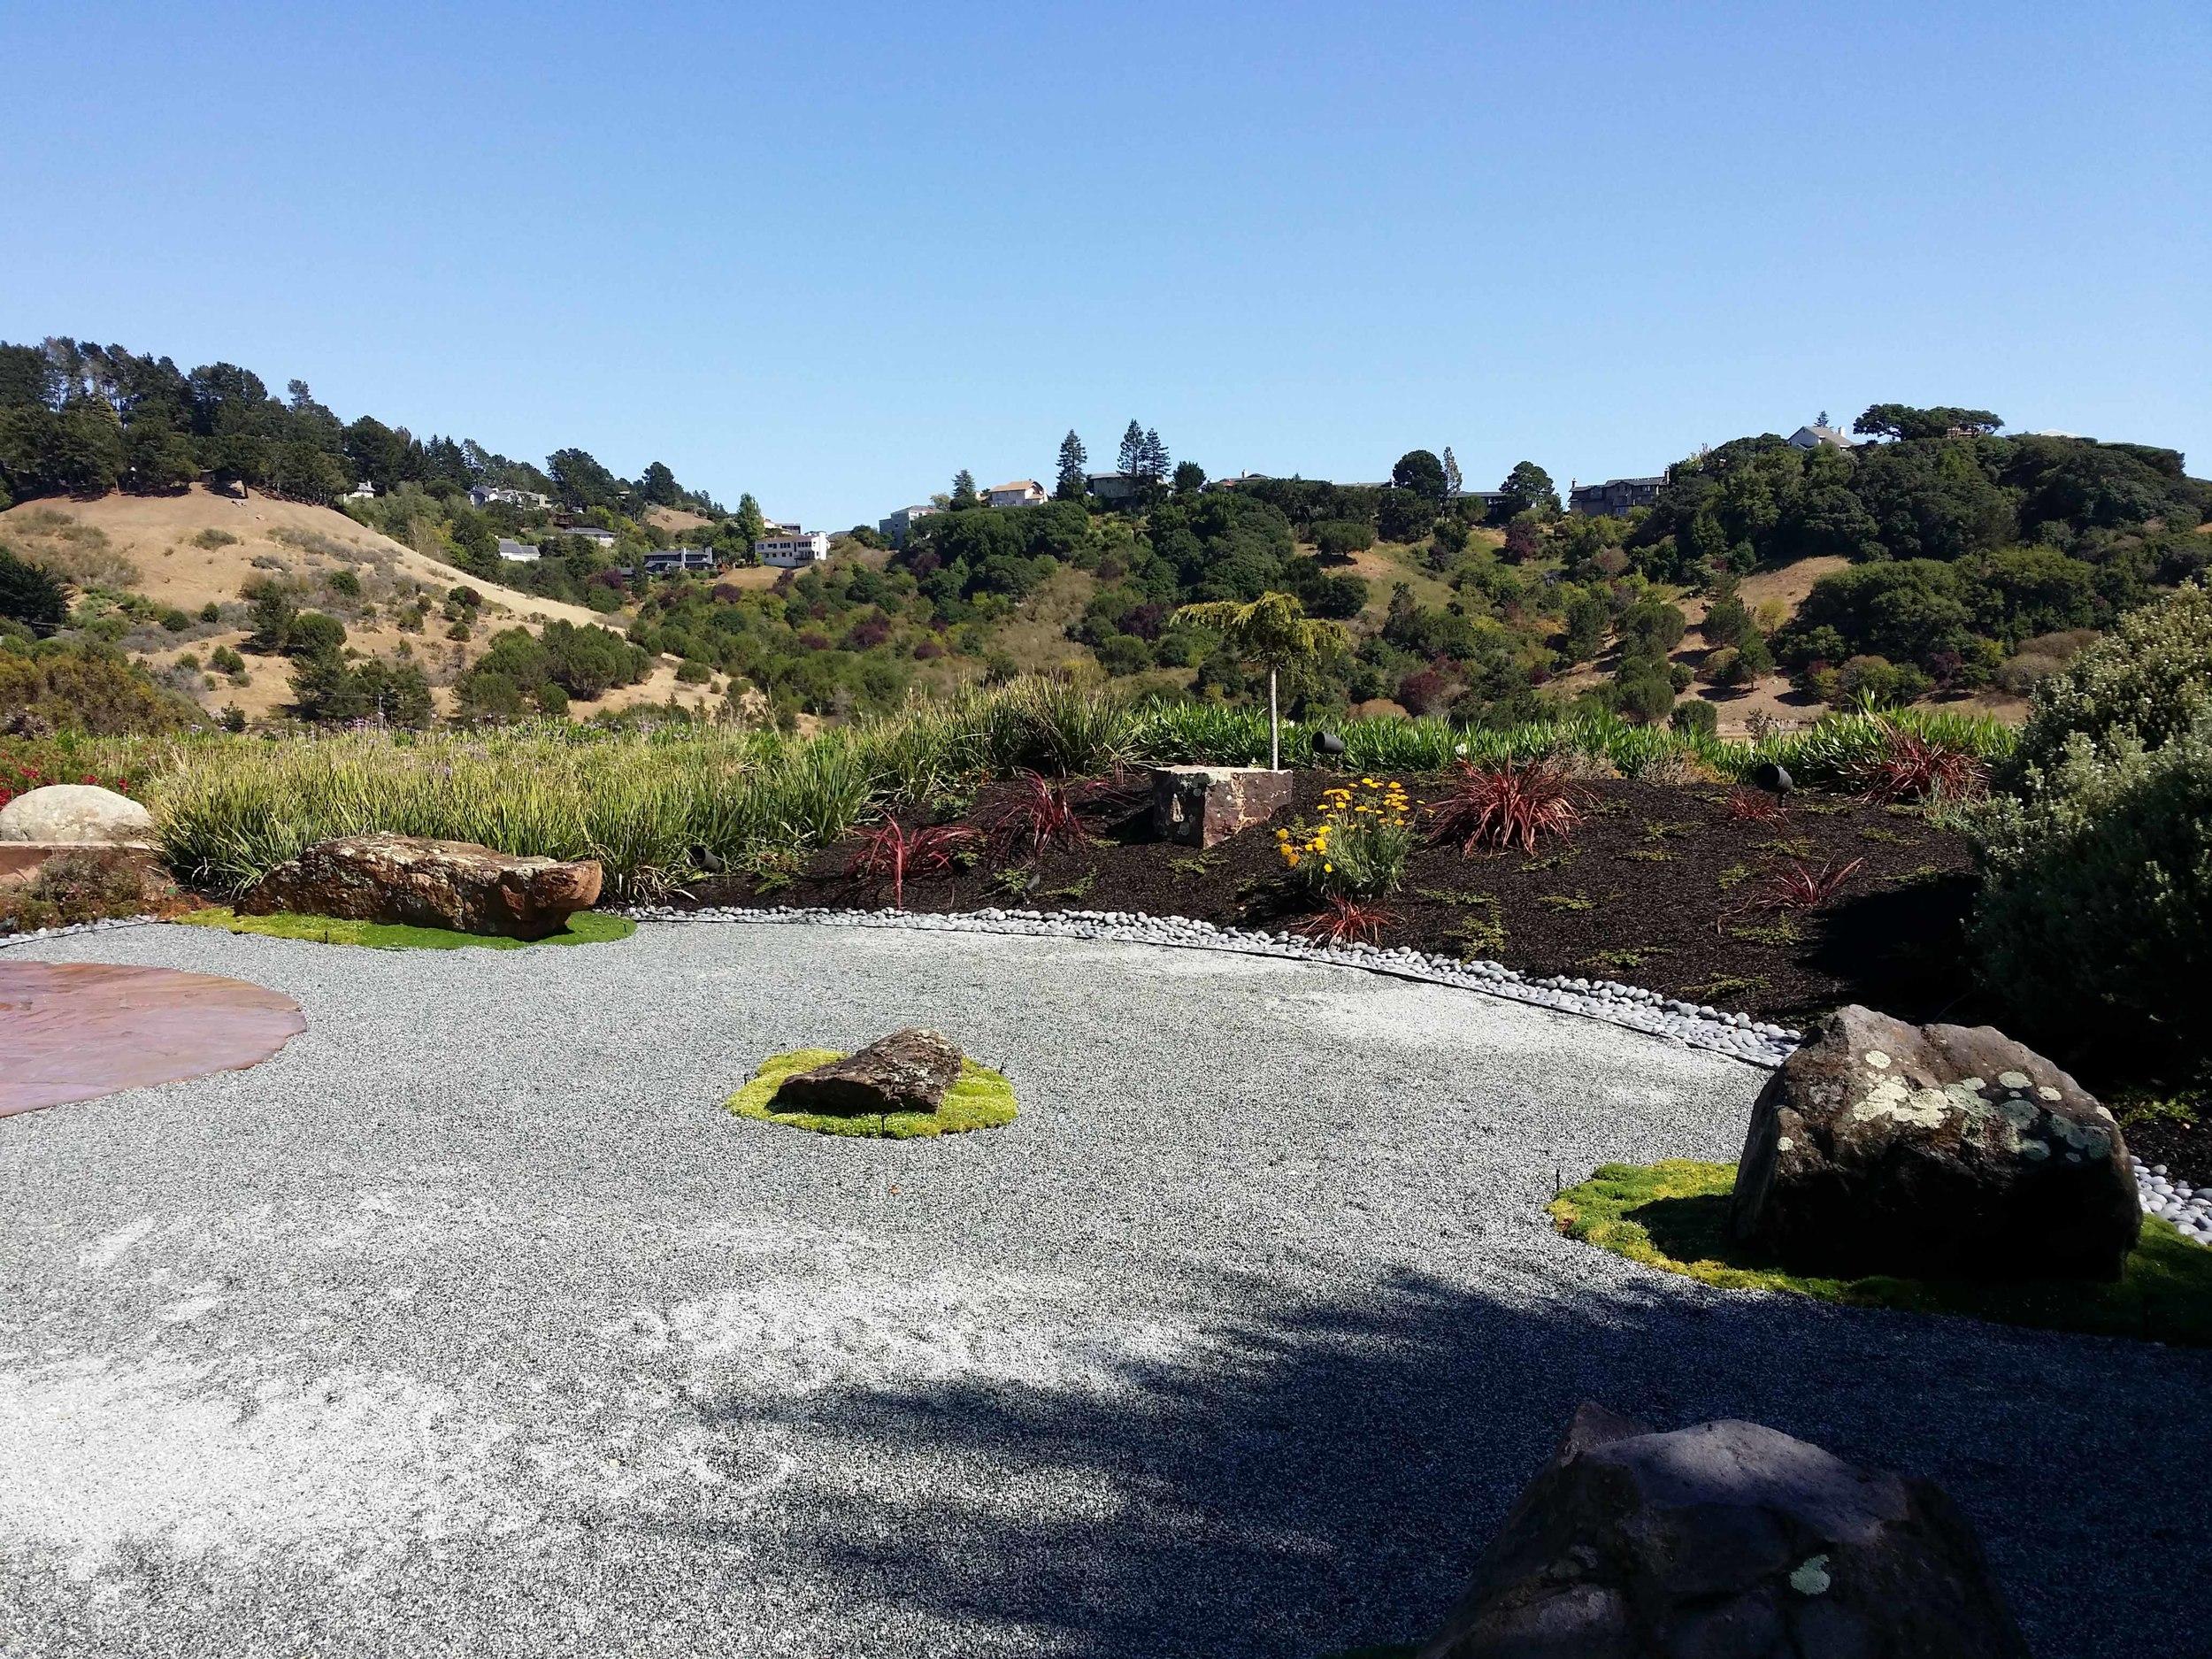 Zen garden design mill valley landscape architect - Mystical Landscapes